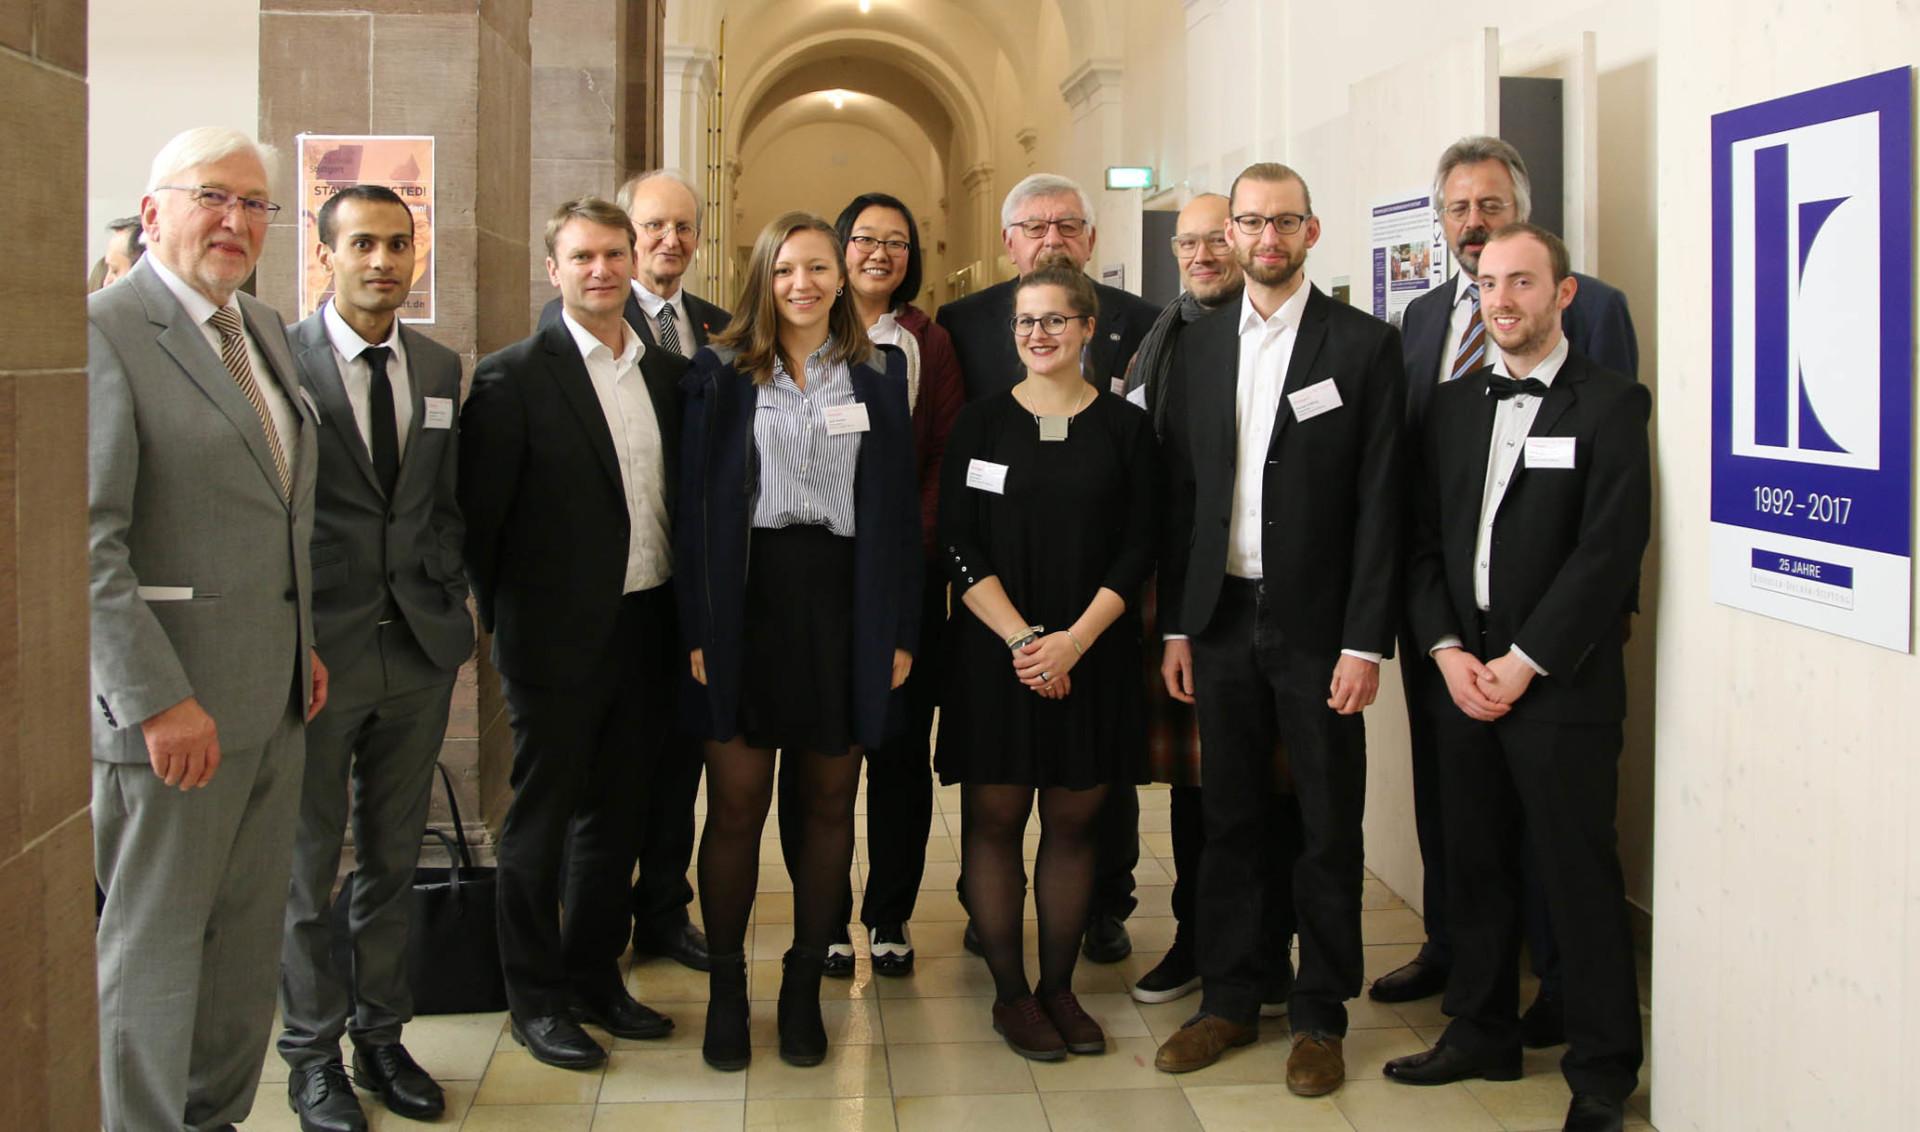 Knödler-Decker-Stiftung STIPENDIEN